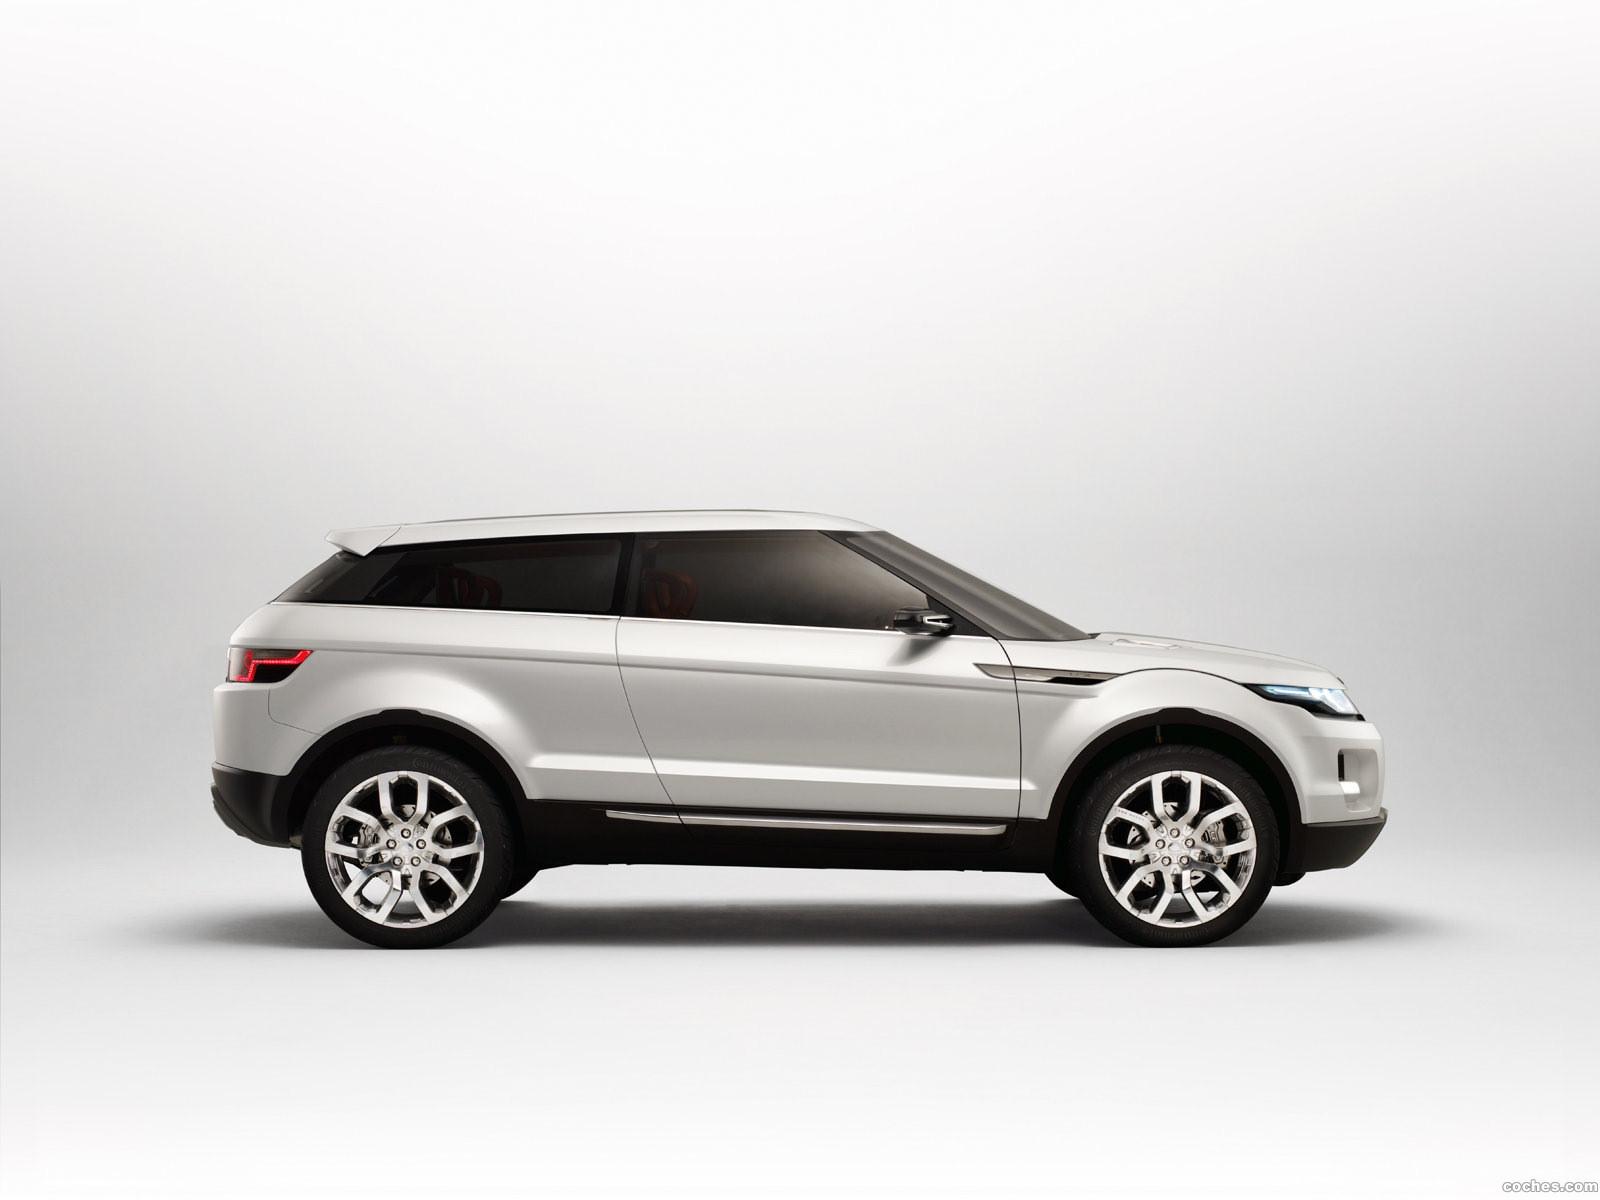 Foto 10 de Land Rover LRX Concept 2007